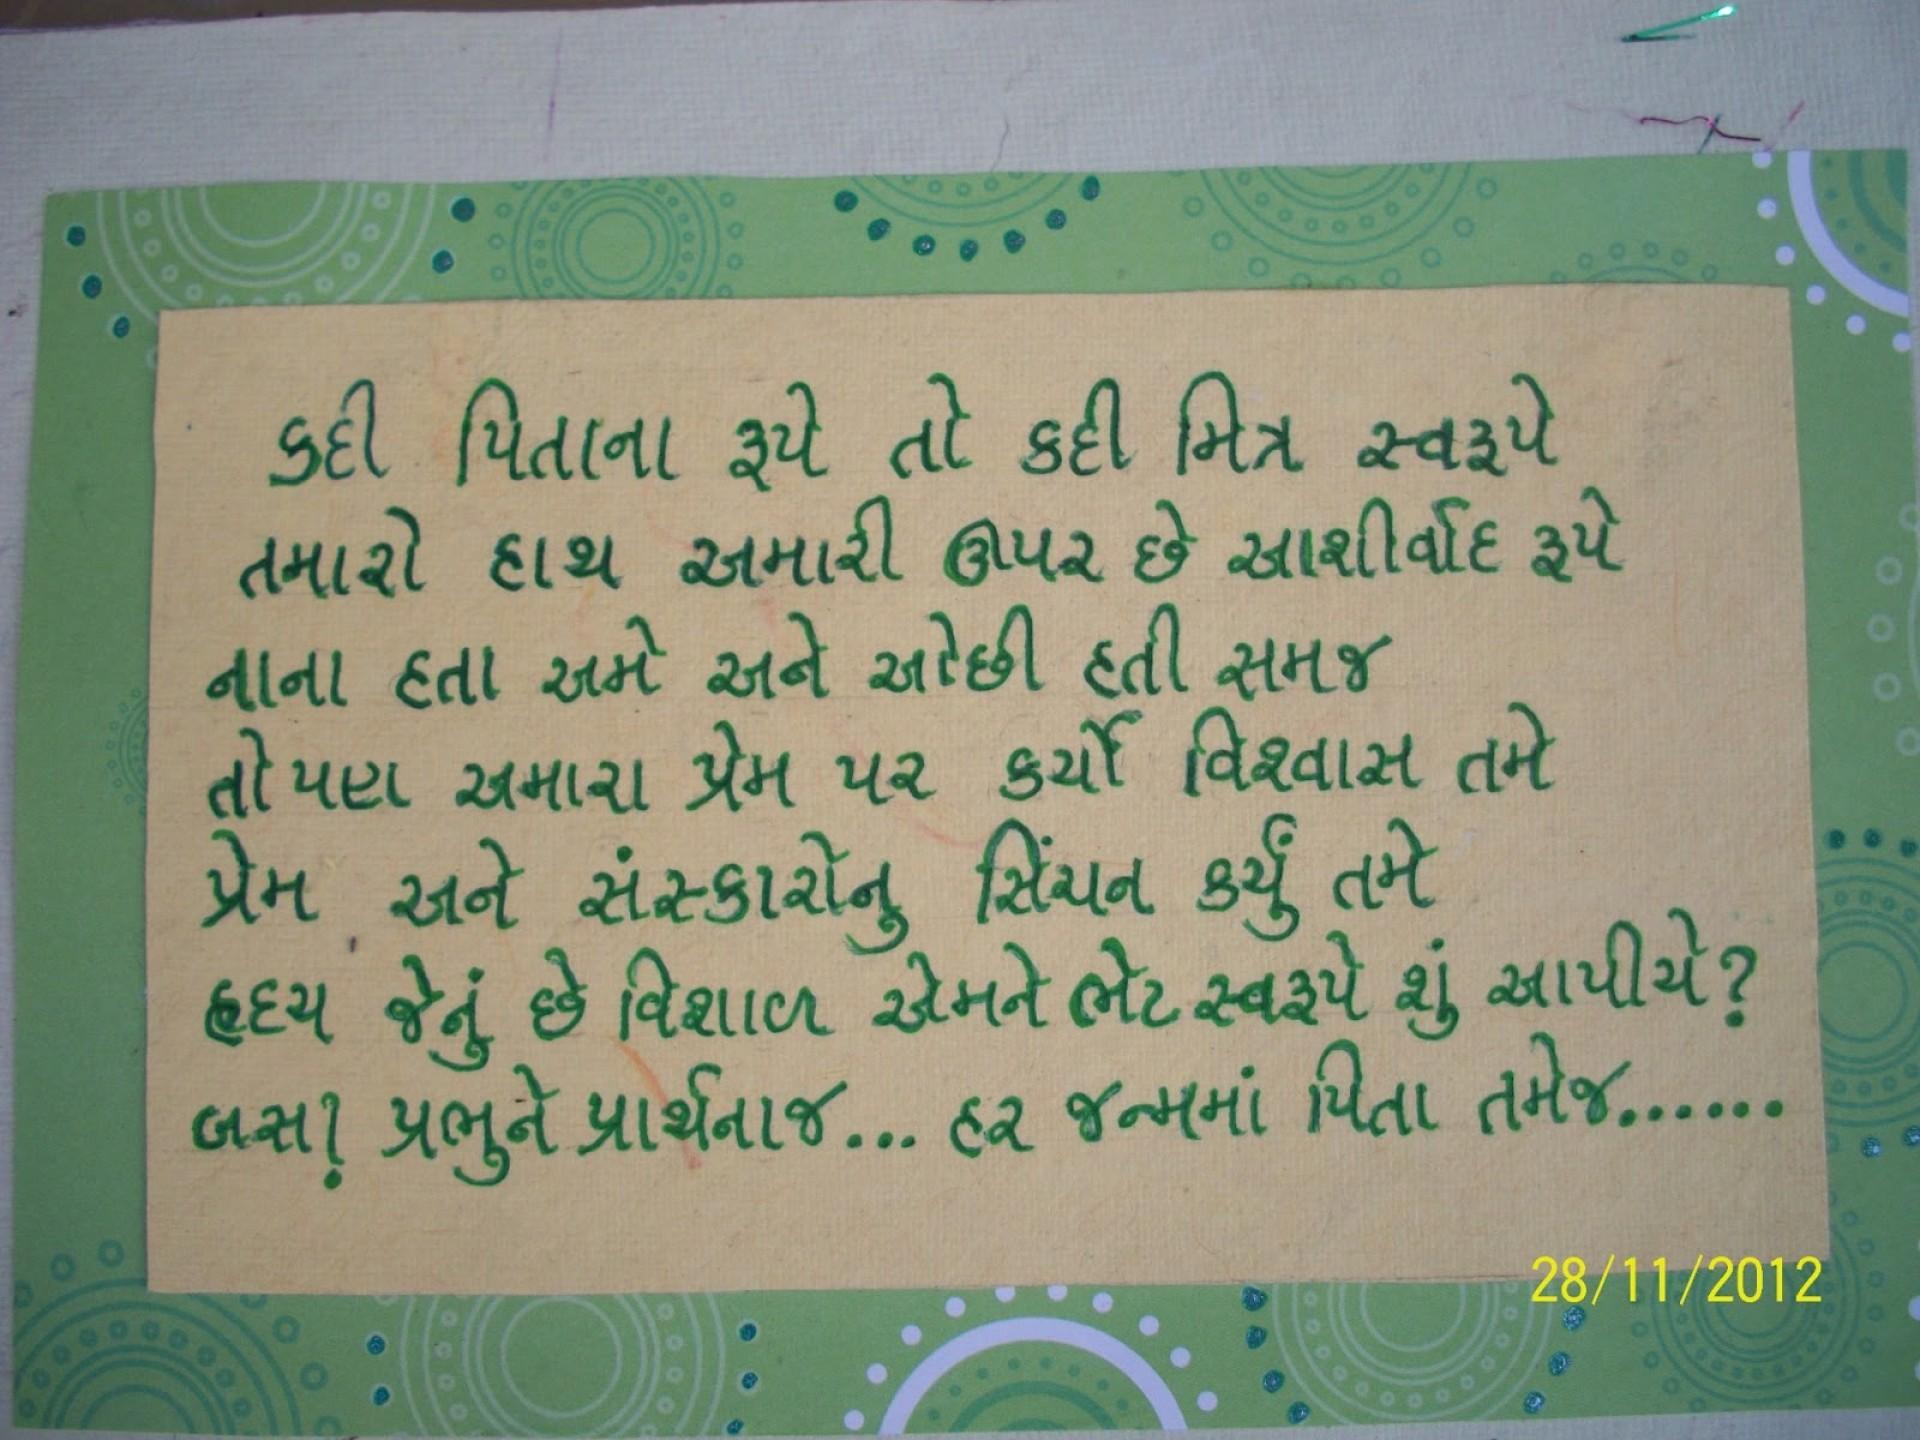 014 Essay Example Mothers Love Phenomenal Wikipedia In Tamil On Gujarati 1920